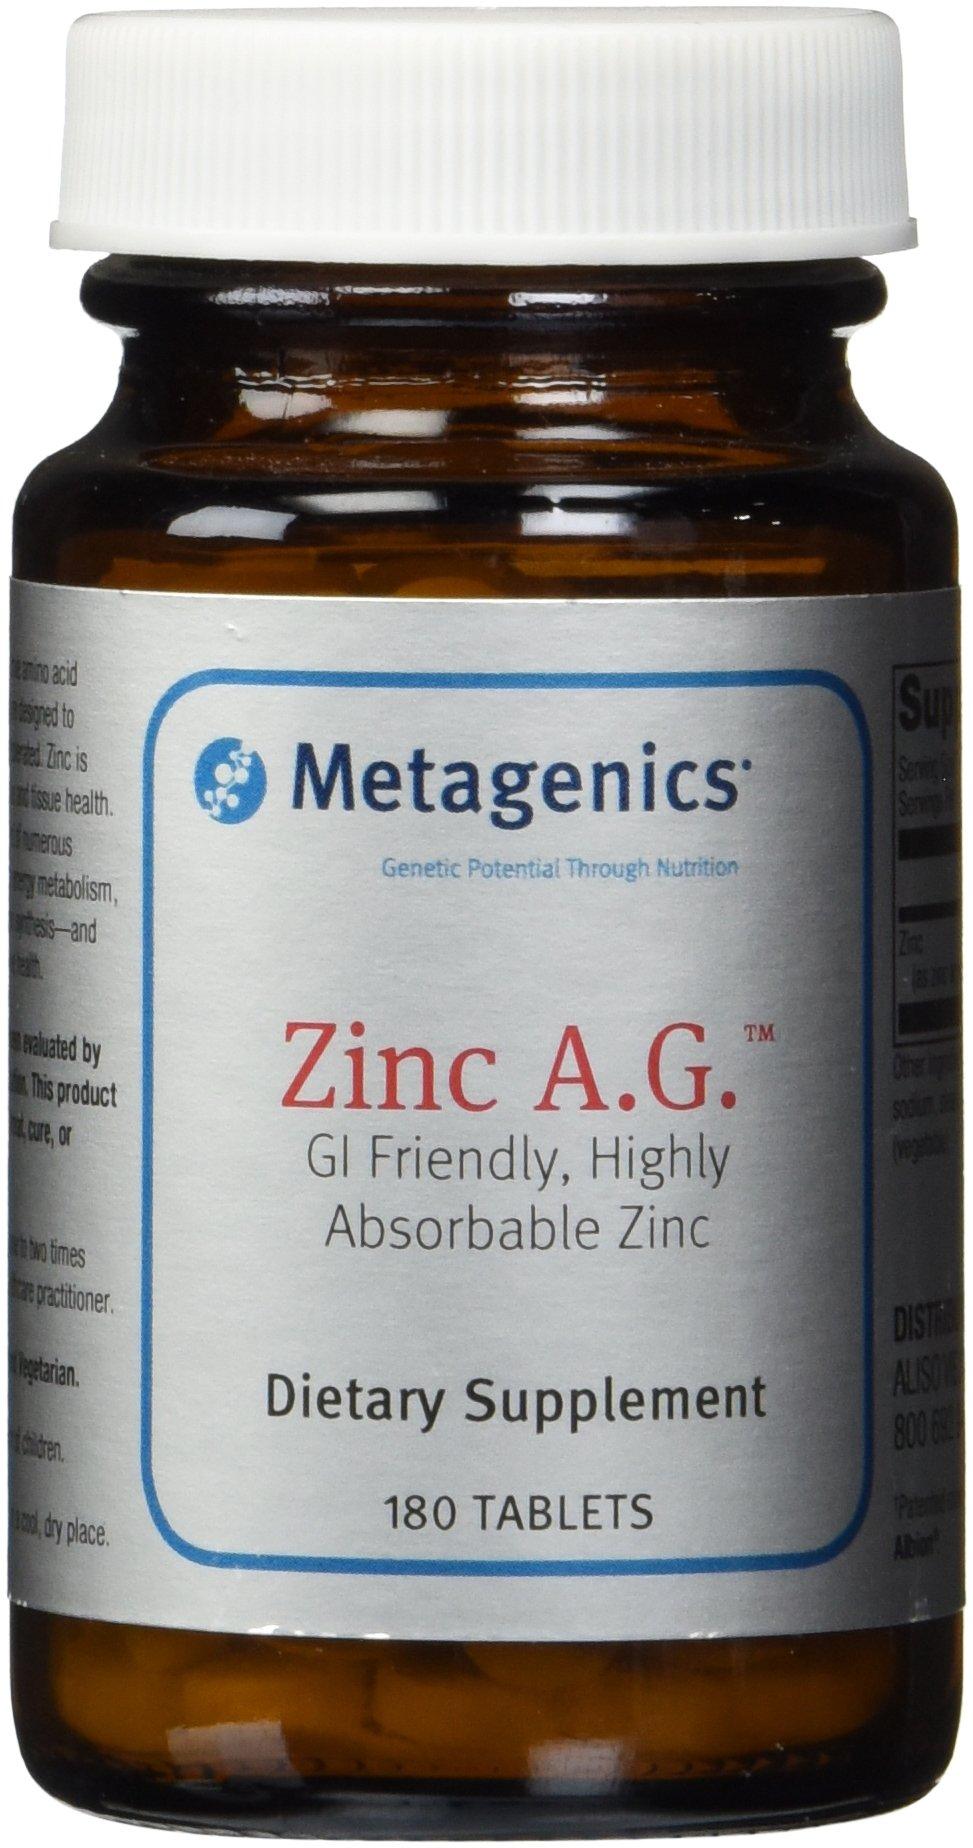 Metagenics Zinc A.G. Tablets, 180 Count